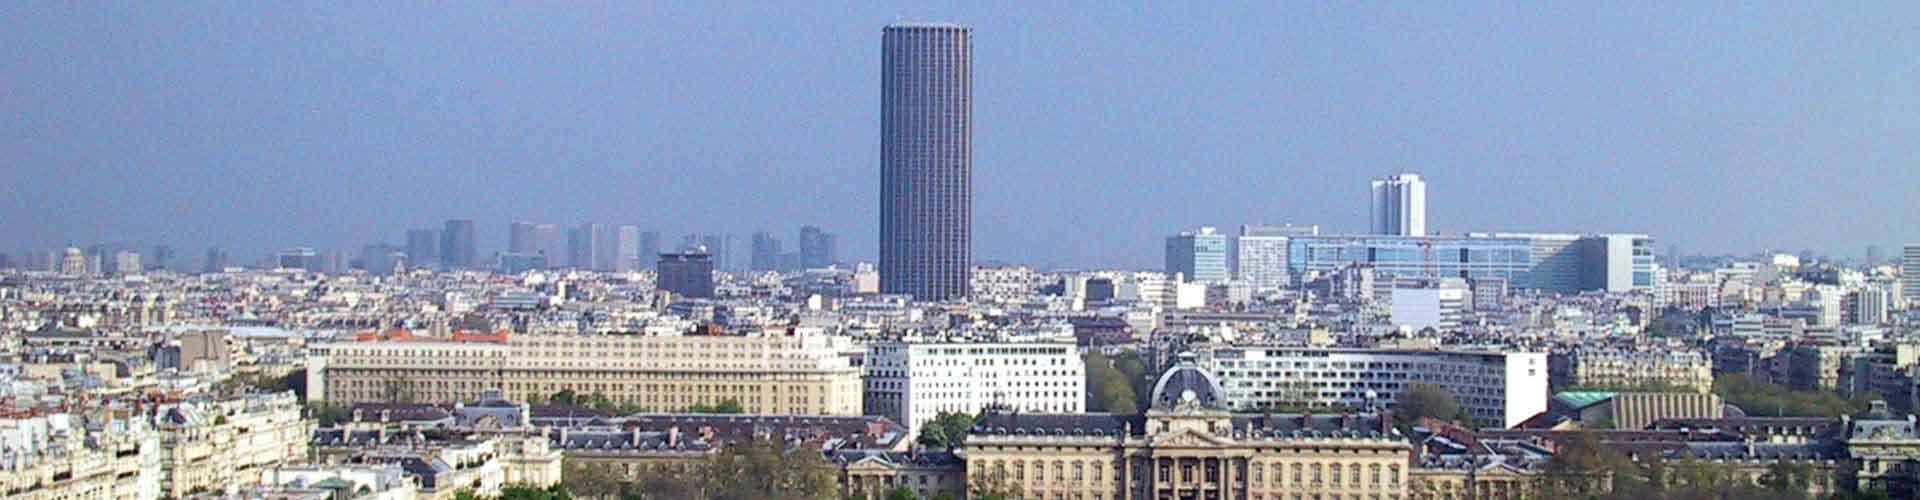 París - Hostales cerca a Tour Montparnasse. Mapas de París, Fotos y comentarios de cada Hostal en París.